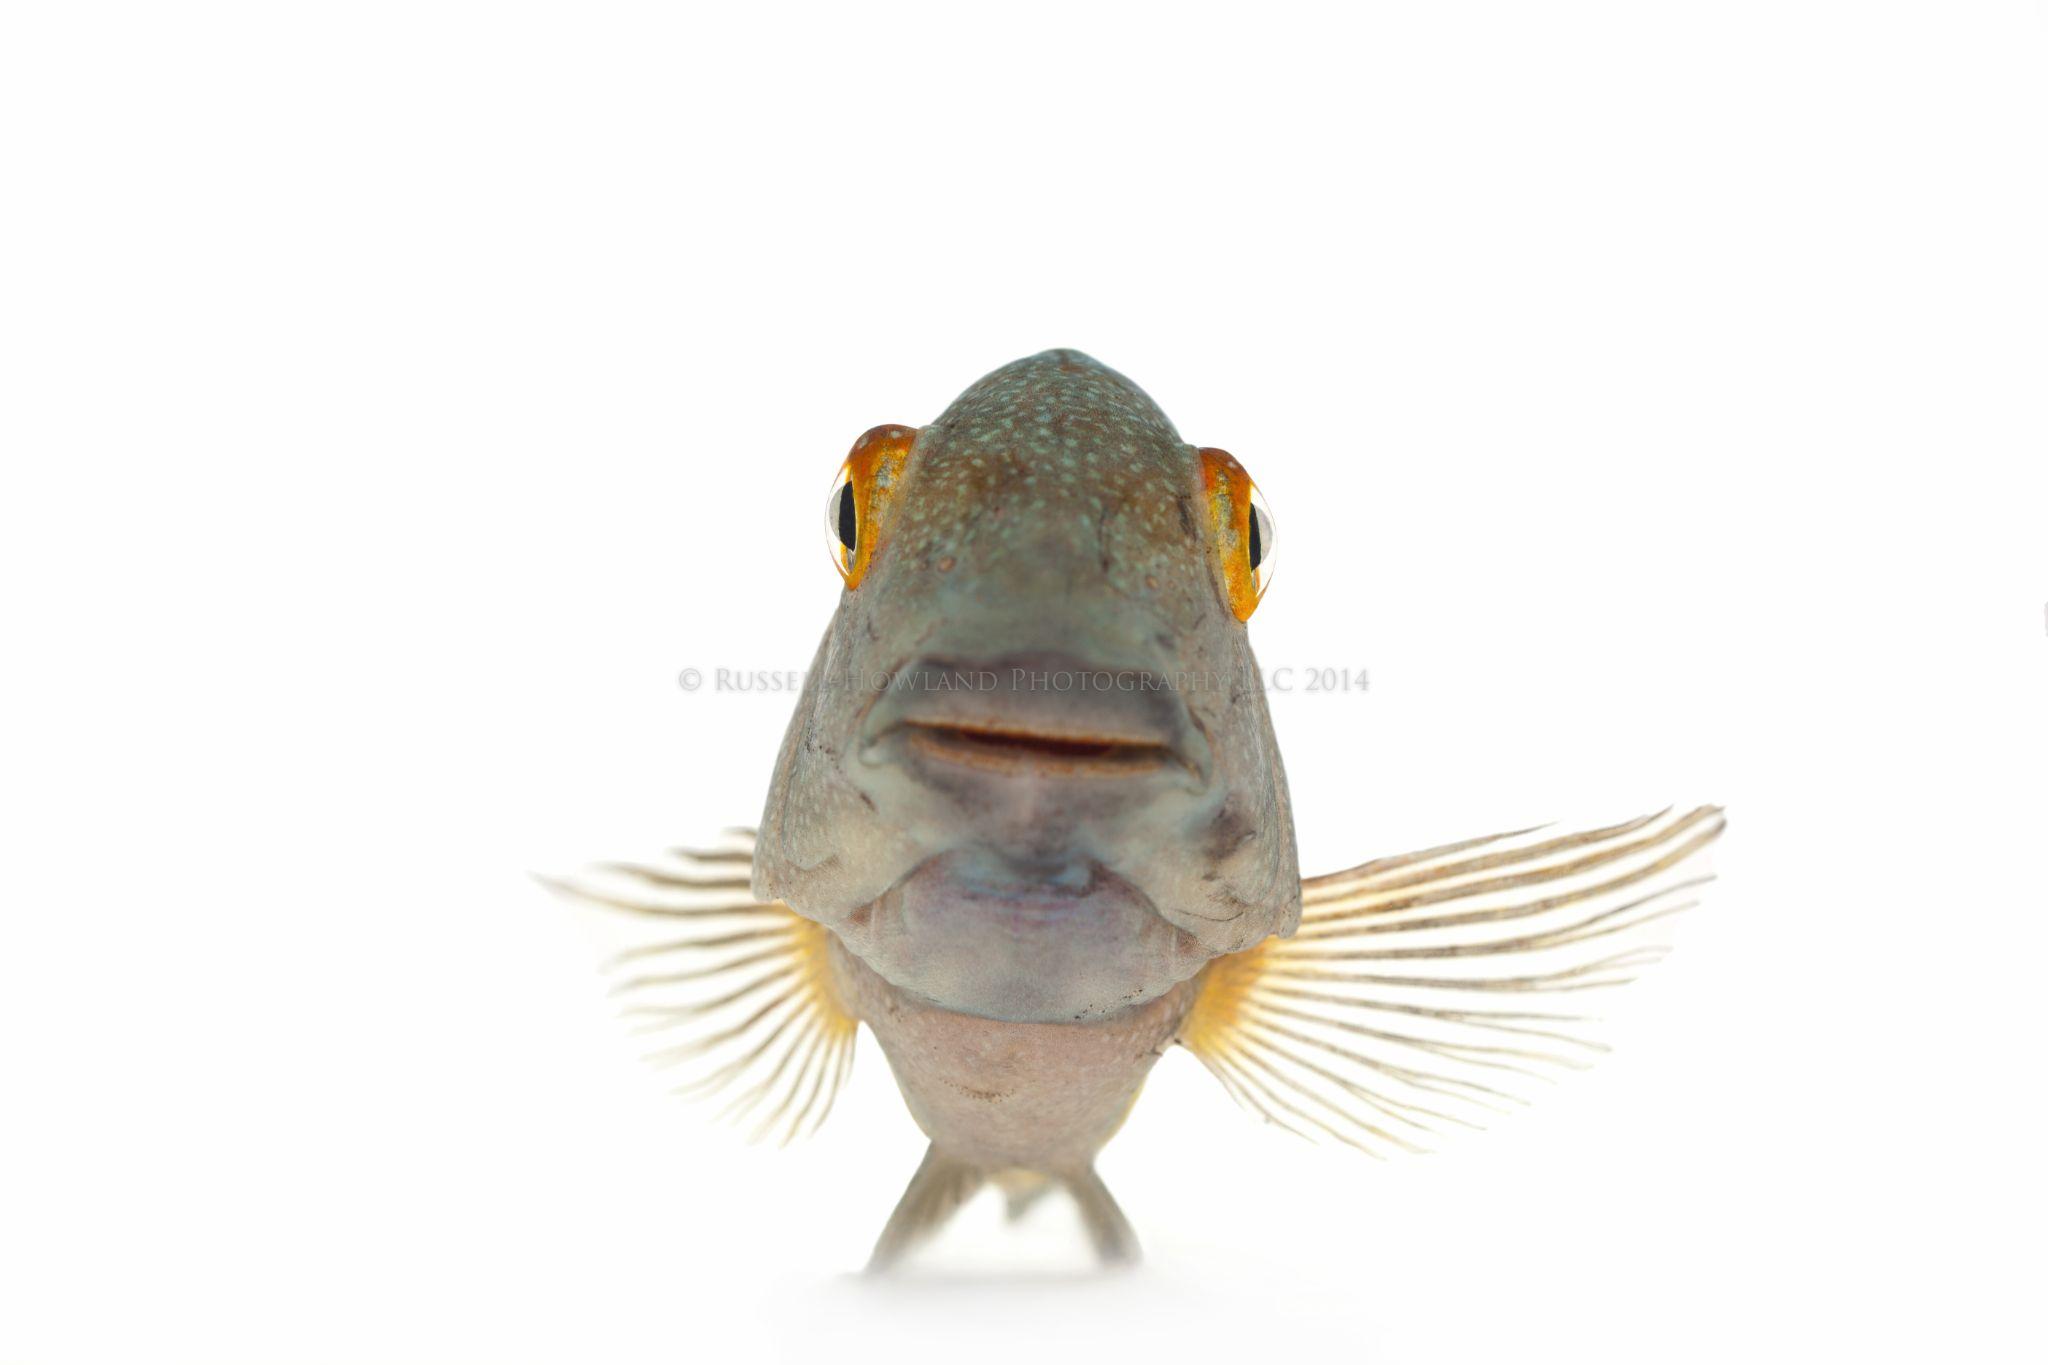 "African Cichlid - Tropheus Moorii ""Blunt-Head"" by RussellHowlandPhotography"